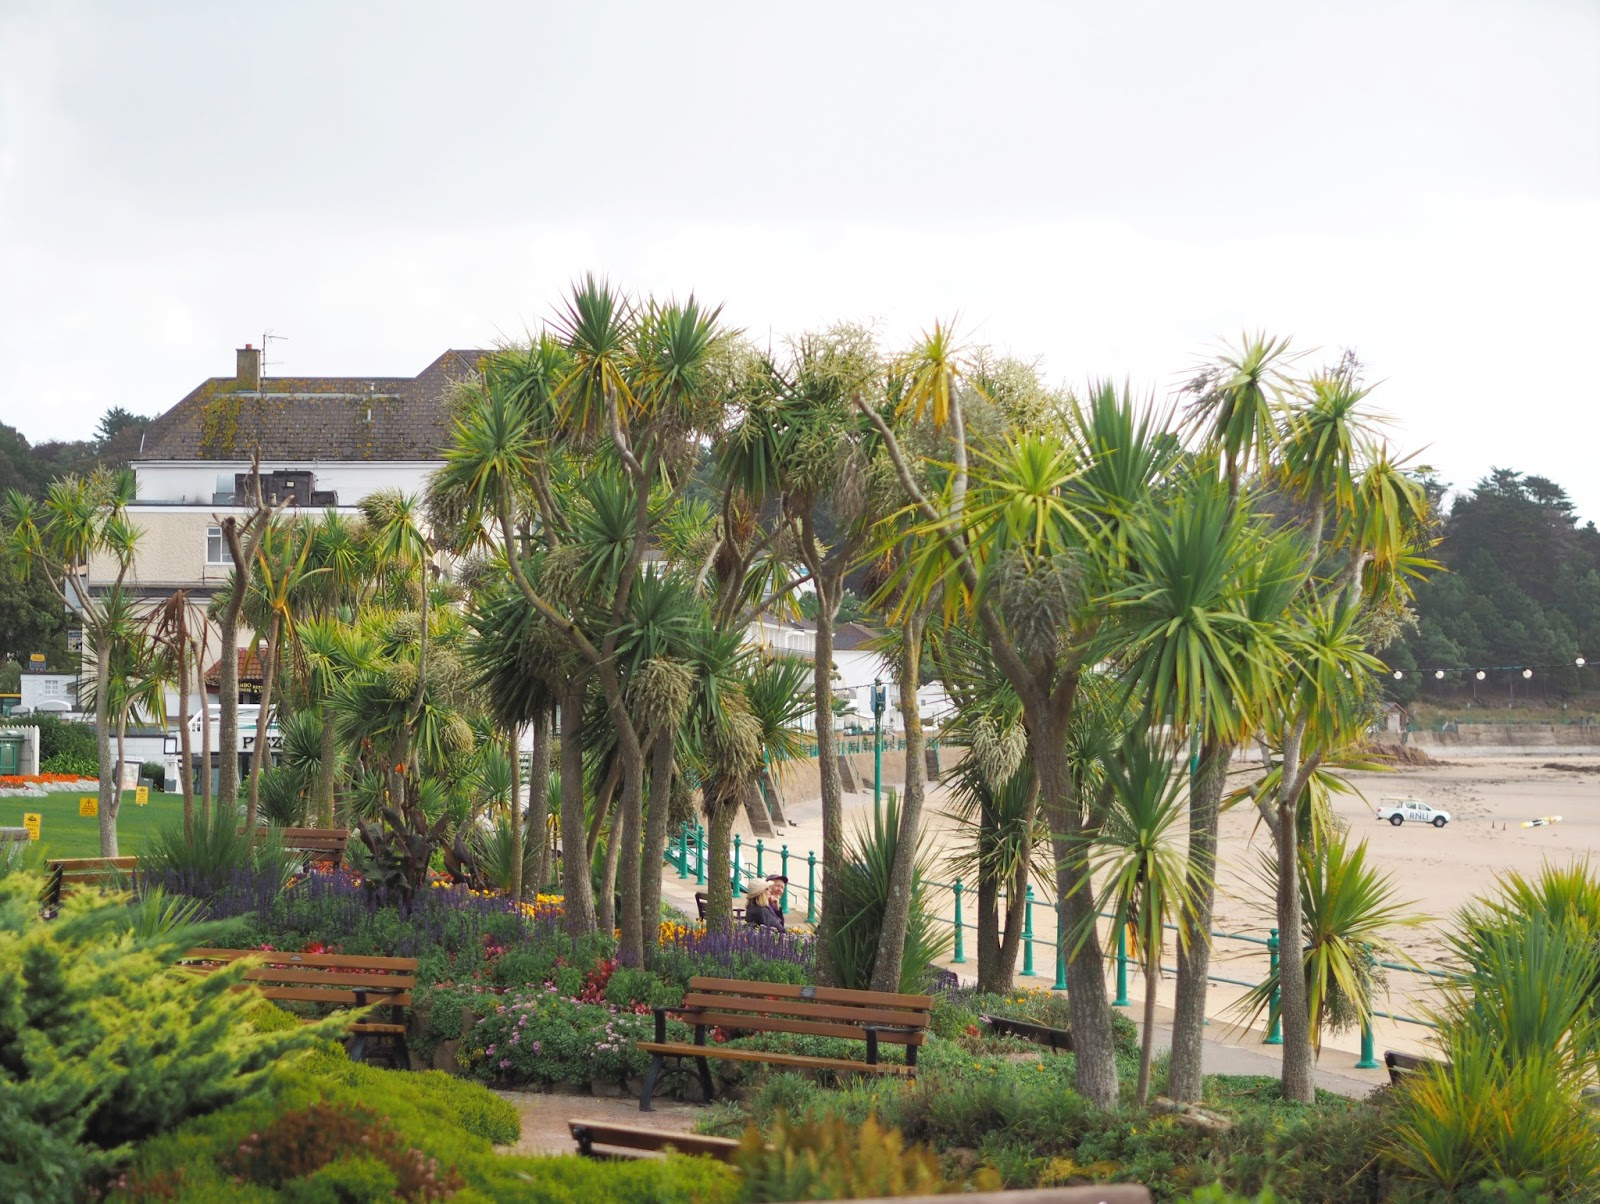 Postcards from St Brelades Bay, Jersey, Channel Islands, Katie Kirk Loves, UK Blogger, Travel Blogger, St Brelades Bay Hotel, #VisitJersey, #TheIslandBreak, UK Travel, Travel Photography, Travel The World, Wanderlust, Women Who Explore, Girls That Wander, Femme Travel